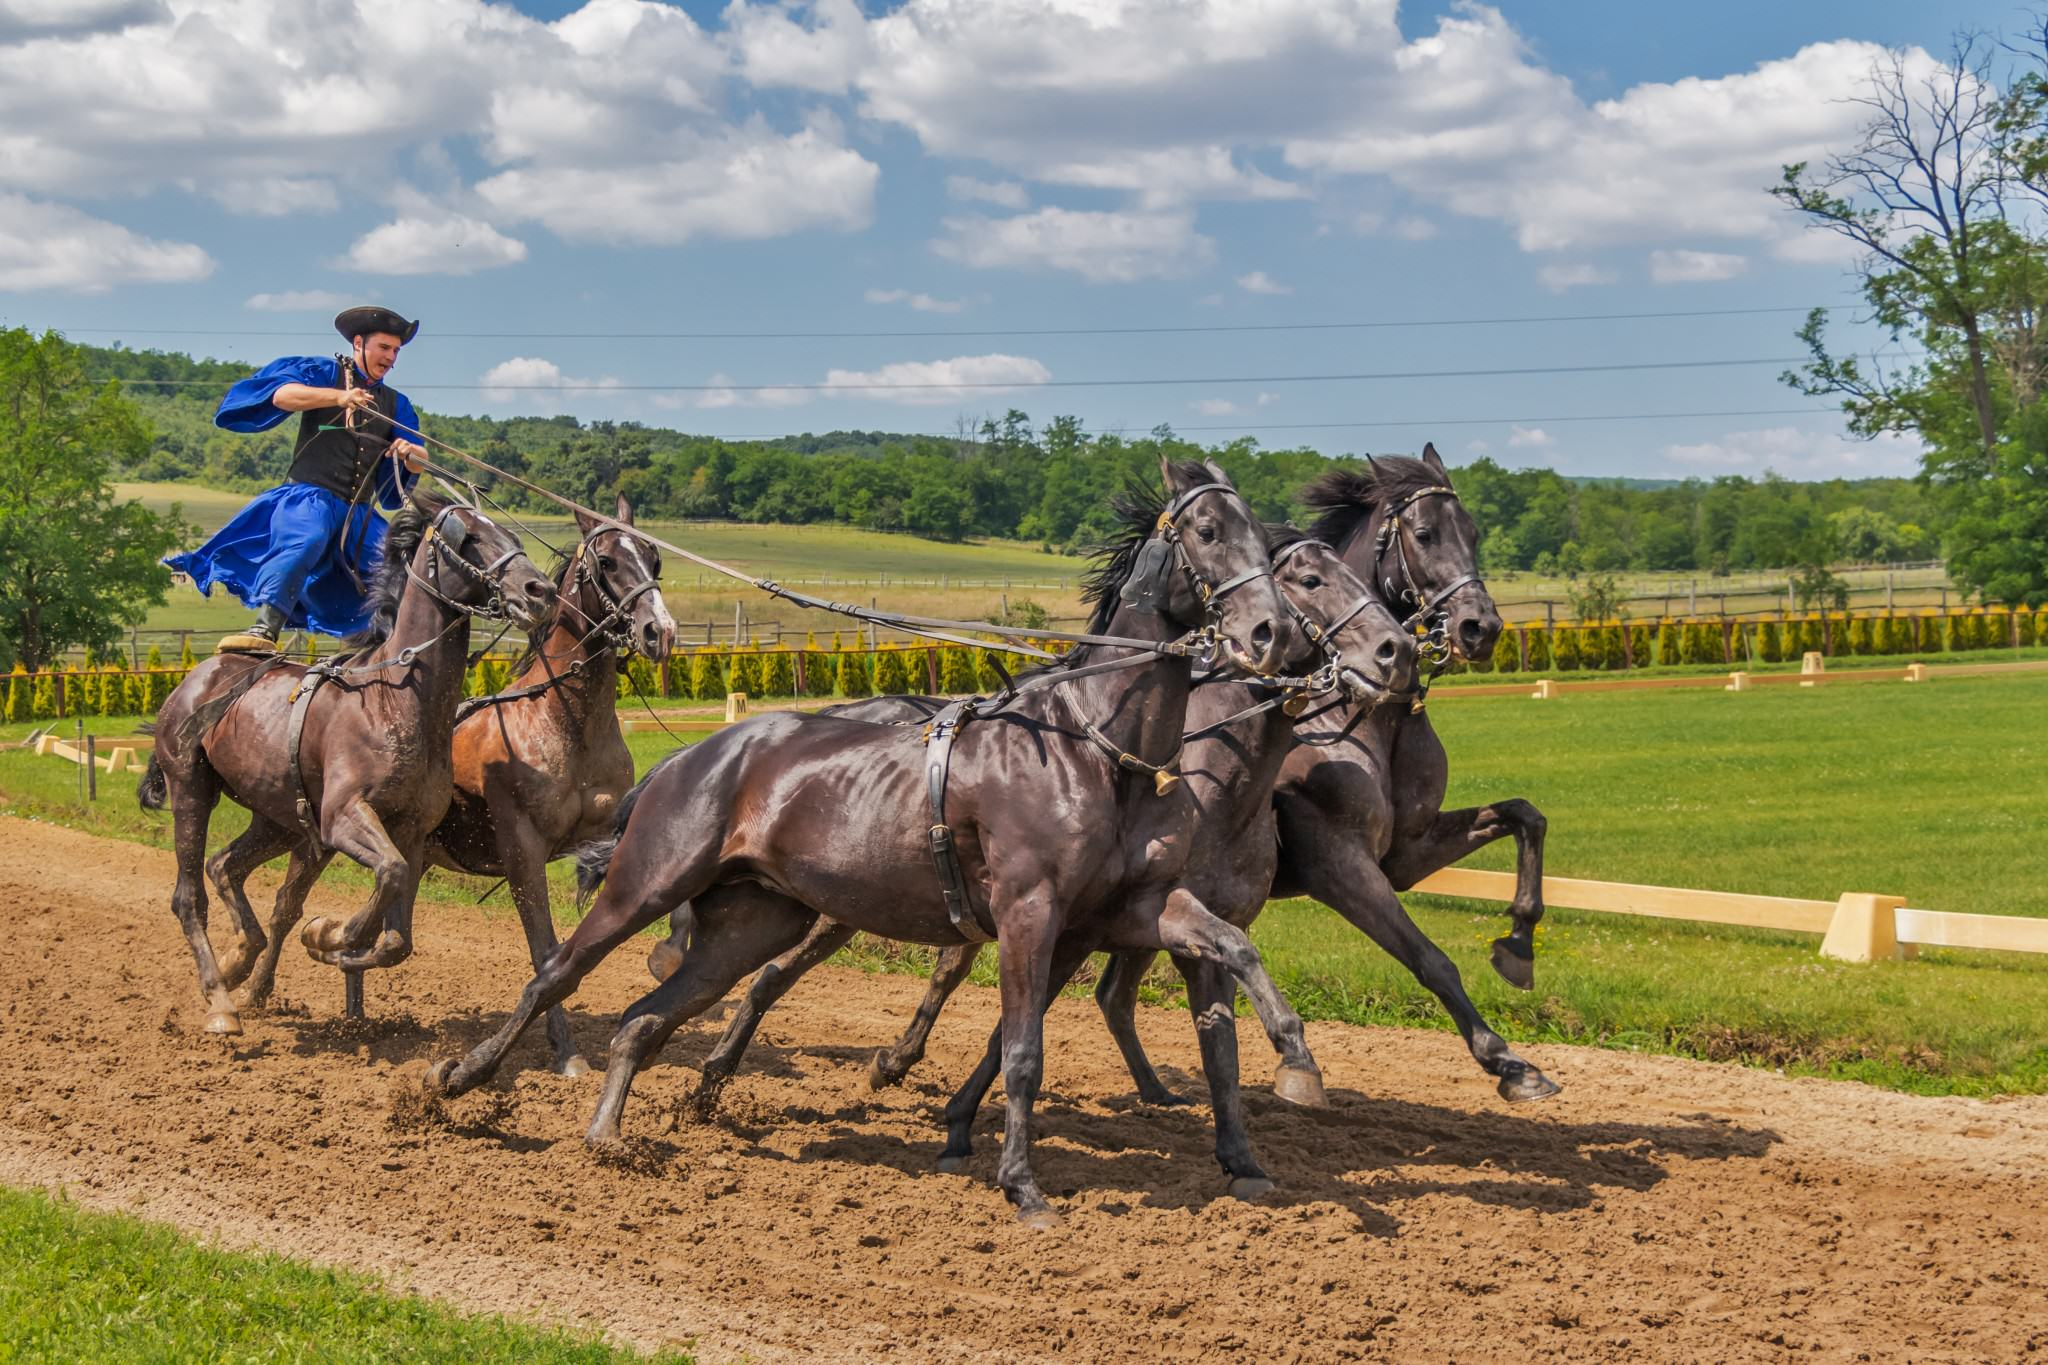 horses-394205